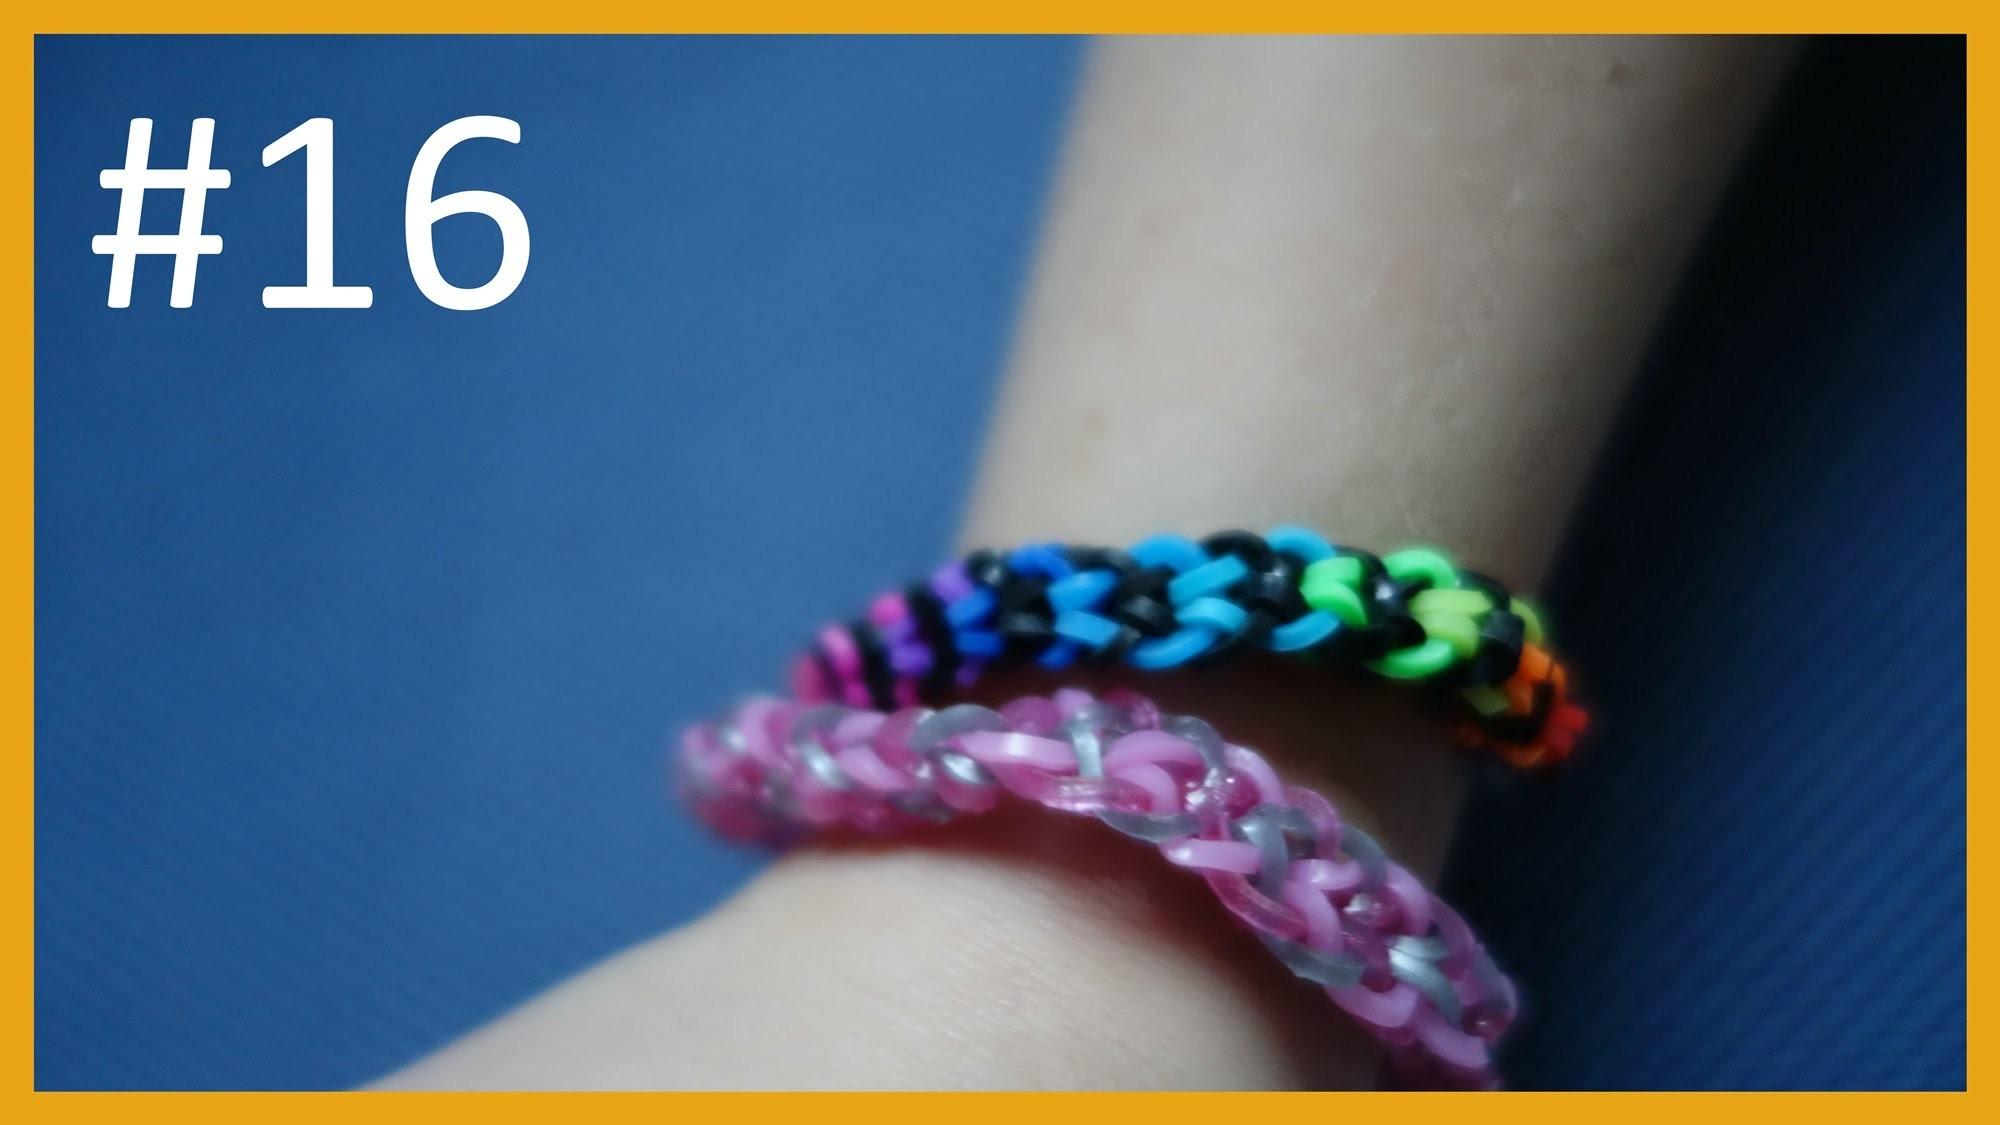 LEKCJA #16 - Gumki Rainbow Loom - MatyldaTV - bransoletki z gumek